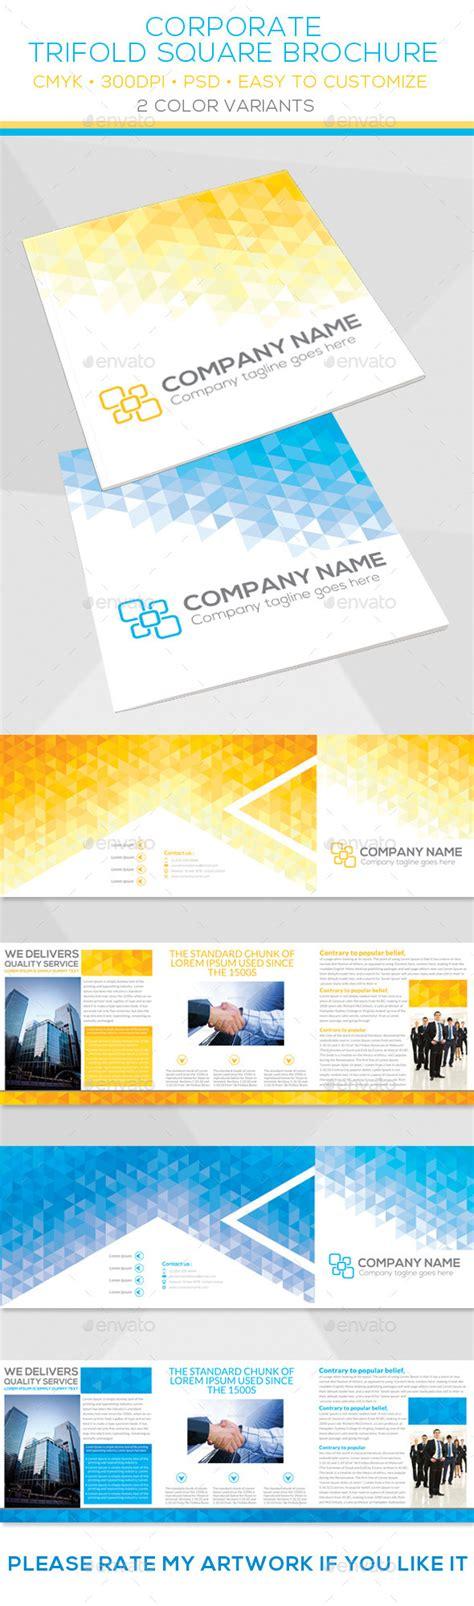 Print Template Graphicriver Corporate Trifold Square Brochure Template 10397788 187 Dondrup Com Square Trifold Brochure Template